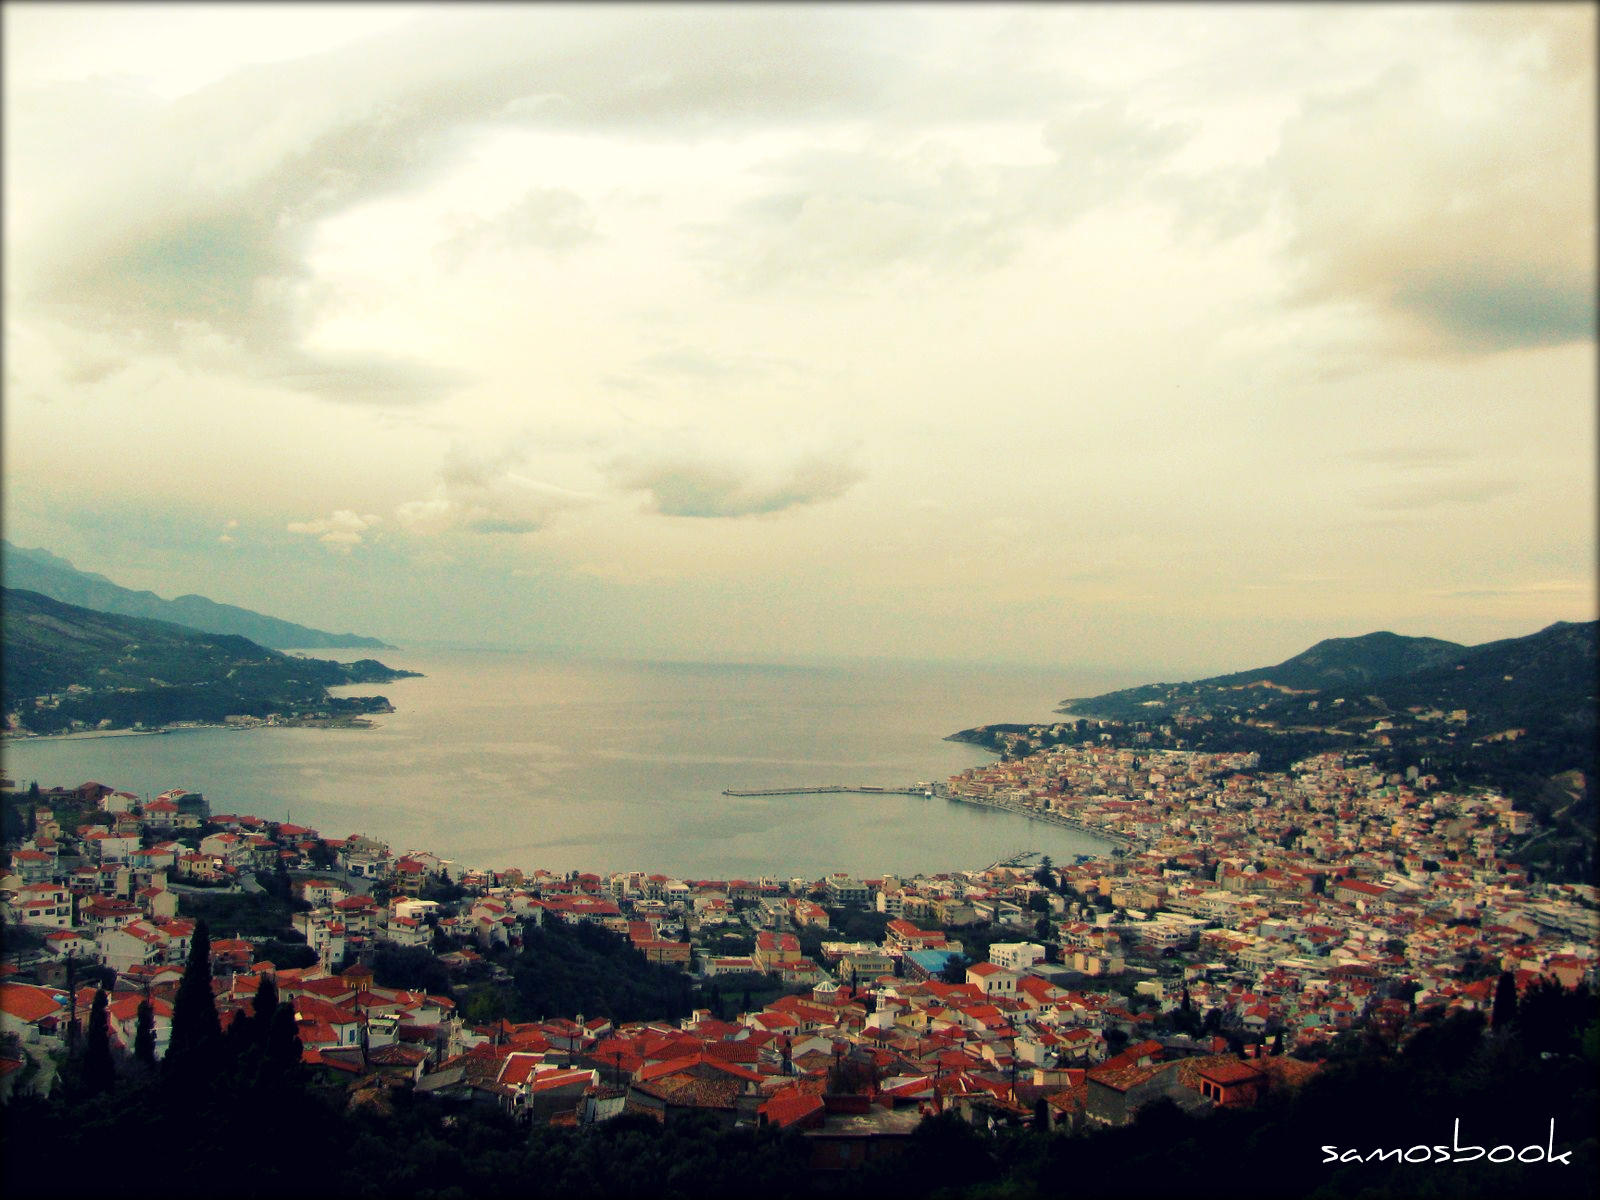 samosbook: Samos Island- best 15 landscapes - samosbook ...